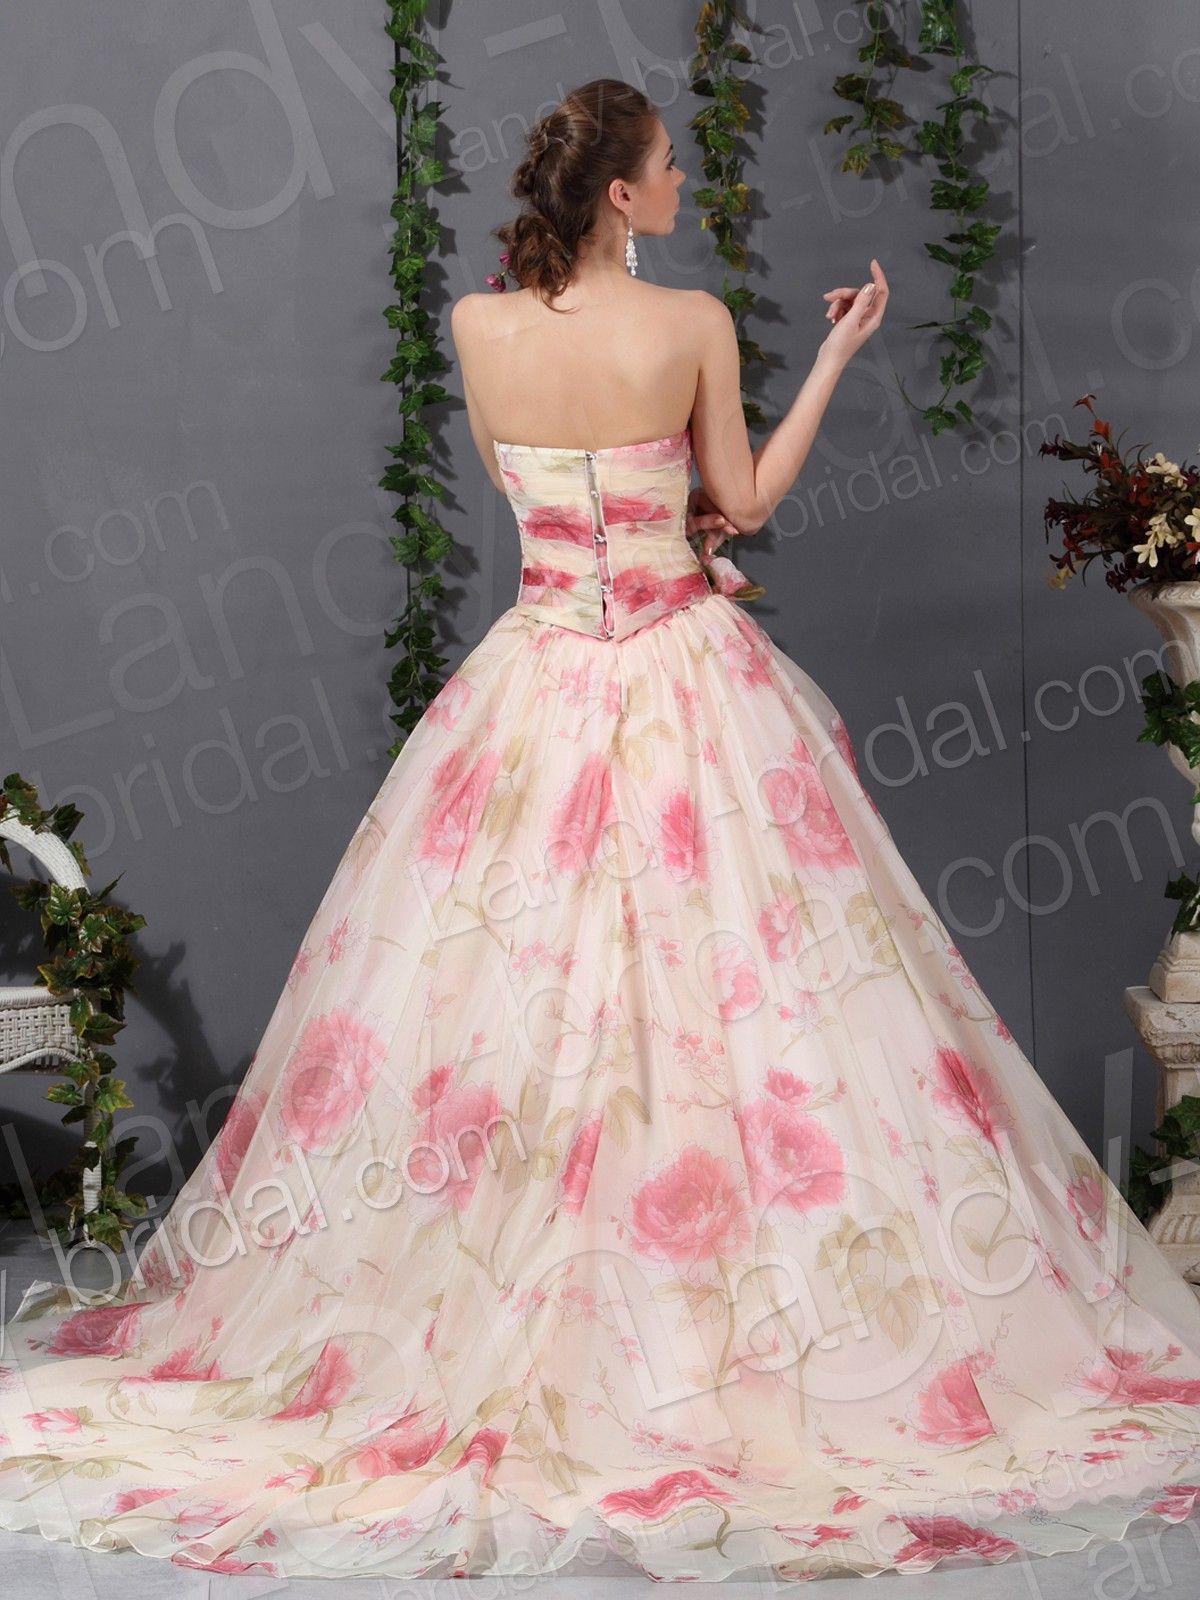 Wedding Dress Designers Games.Designer Ball Gowns Dress Designer Games Dresses Pink